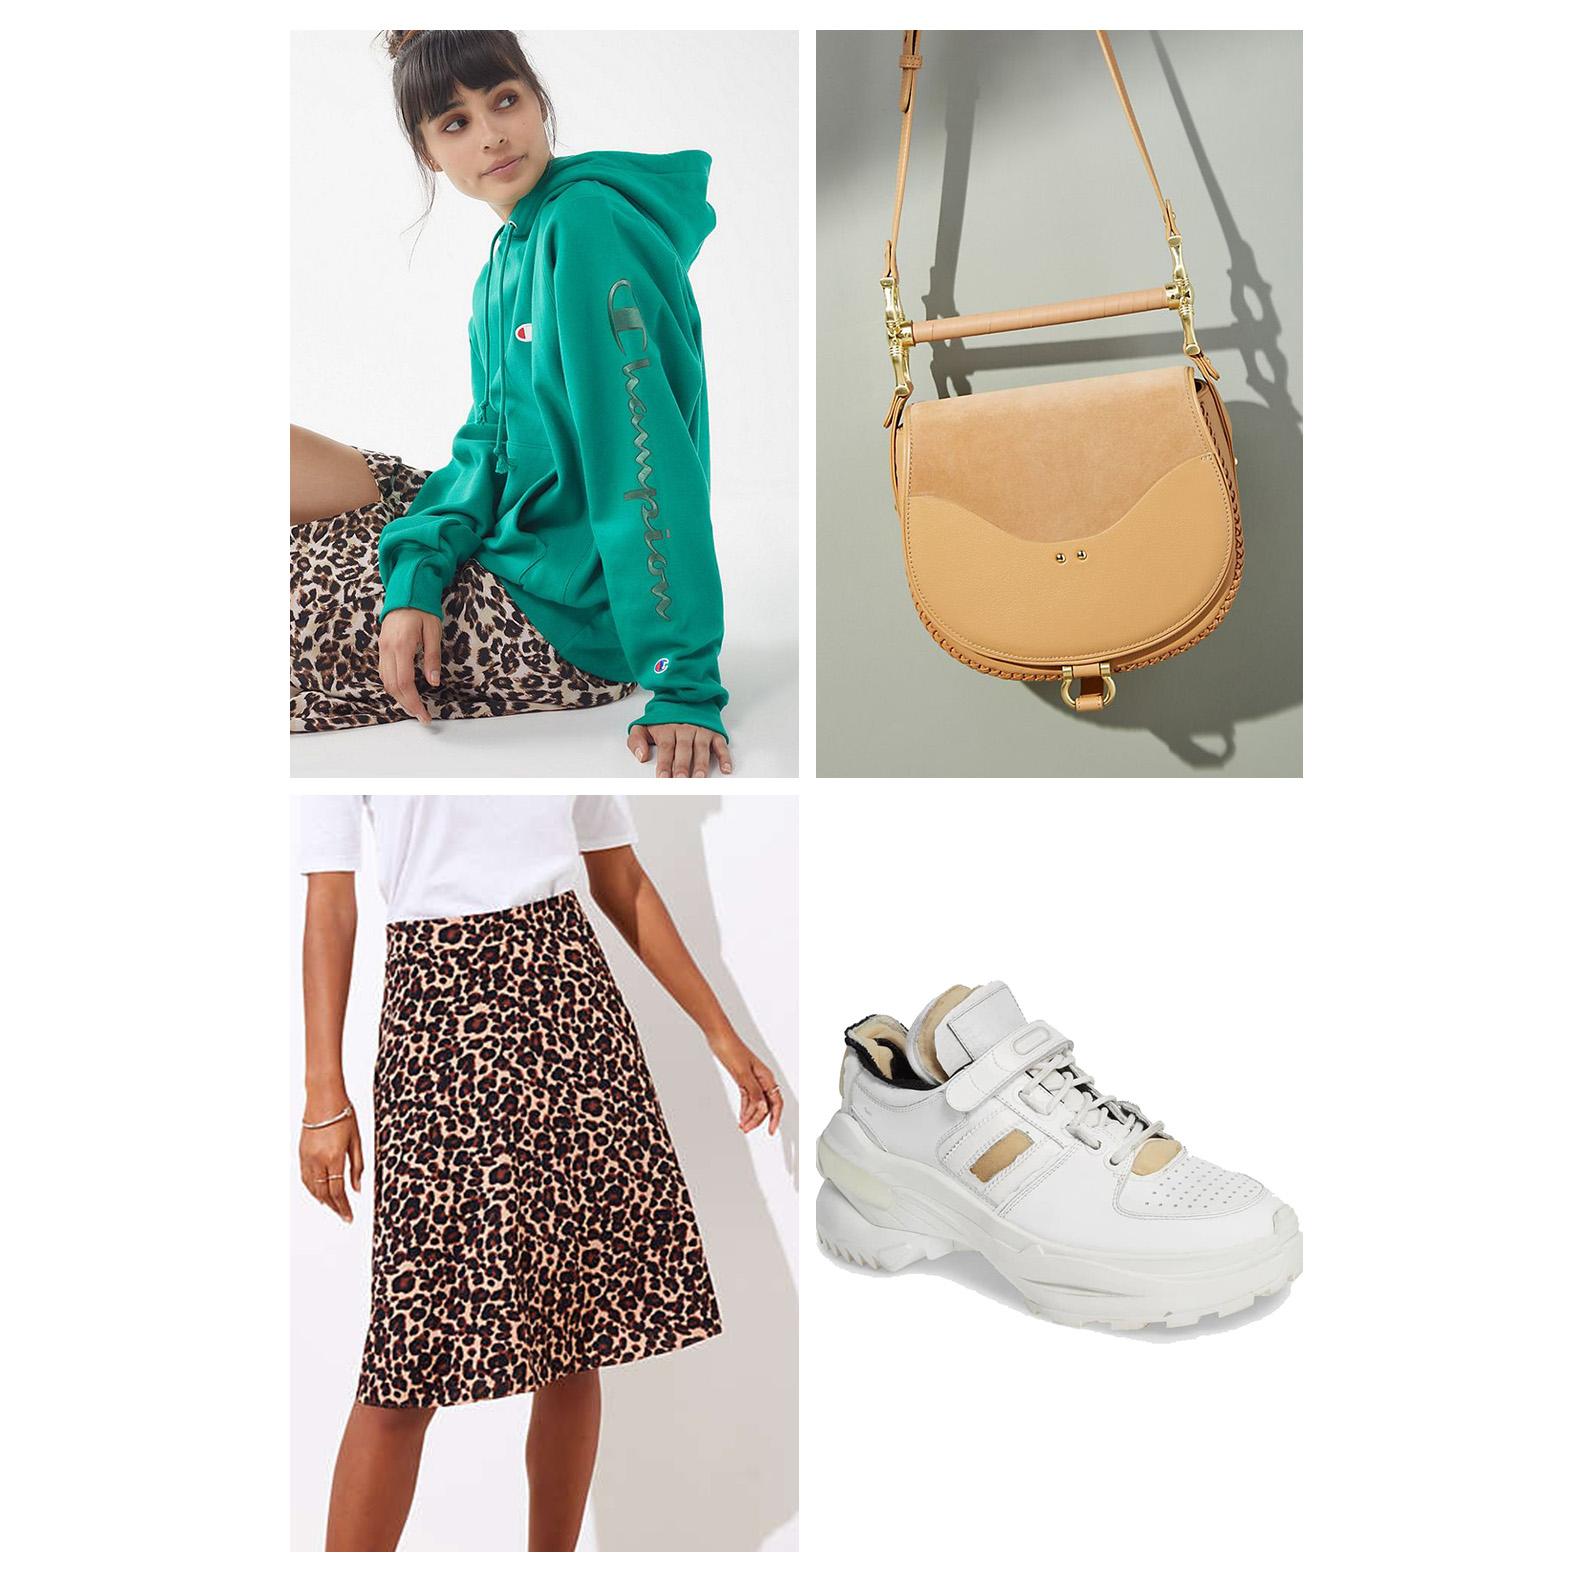 fall-autumn-outfit-weekend-2018-fashion-ideas-leopard-print-skirt-aline-green-hoodie-sweatshirt-white-dad-sneakers-tan-handbag-casual.jpg